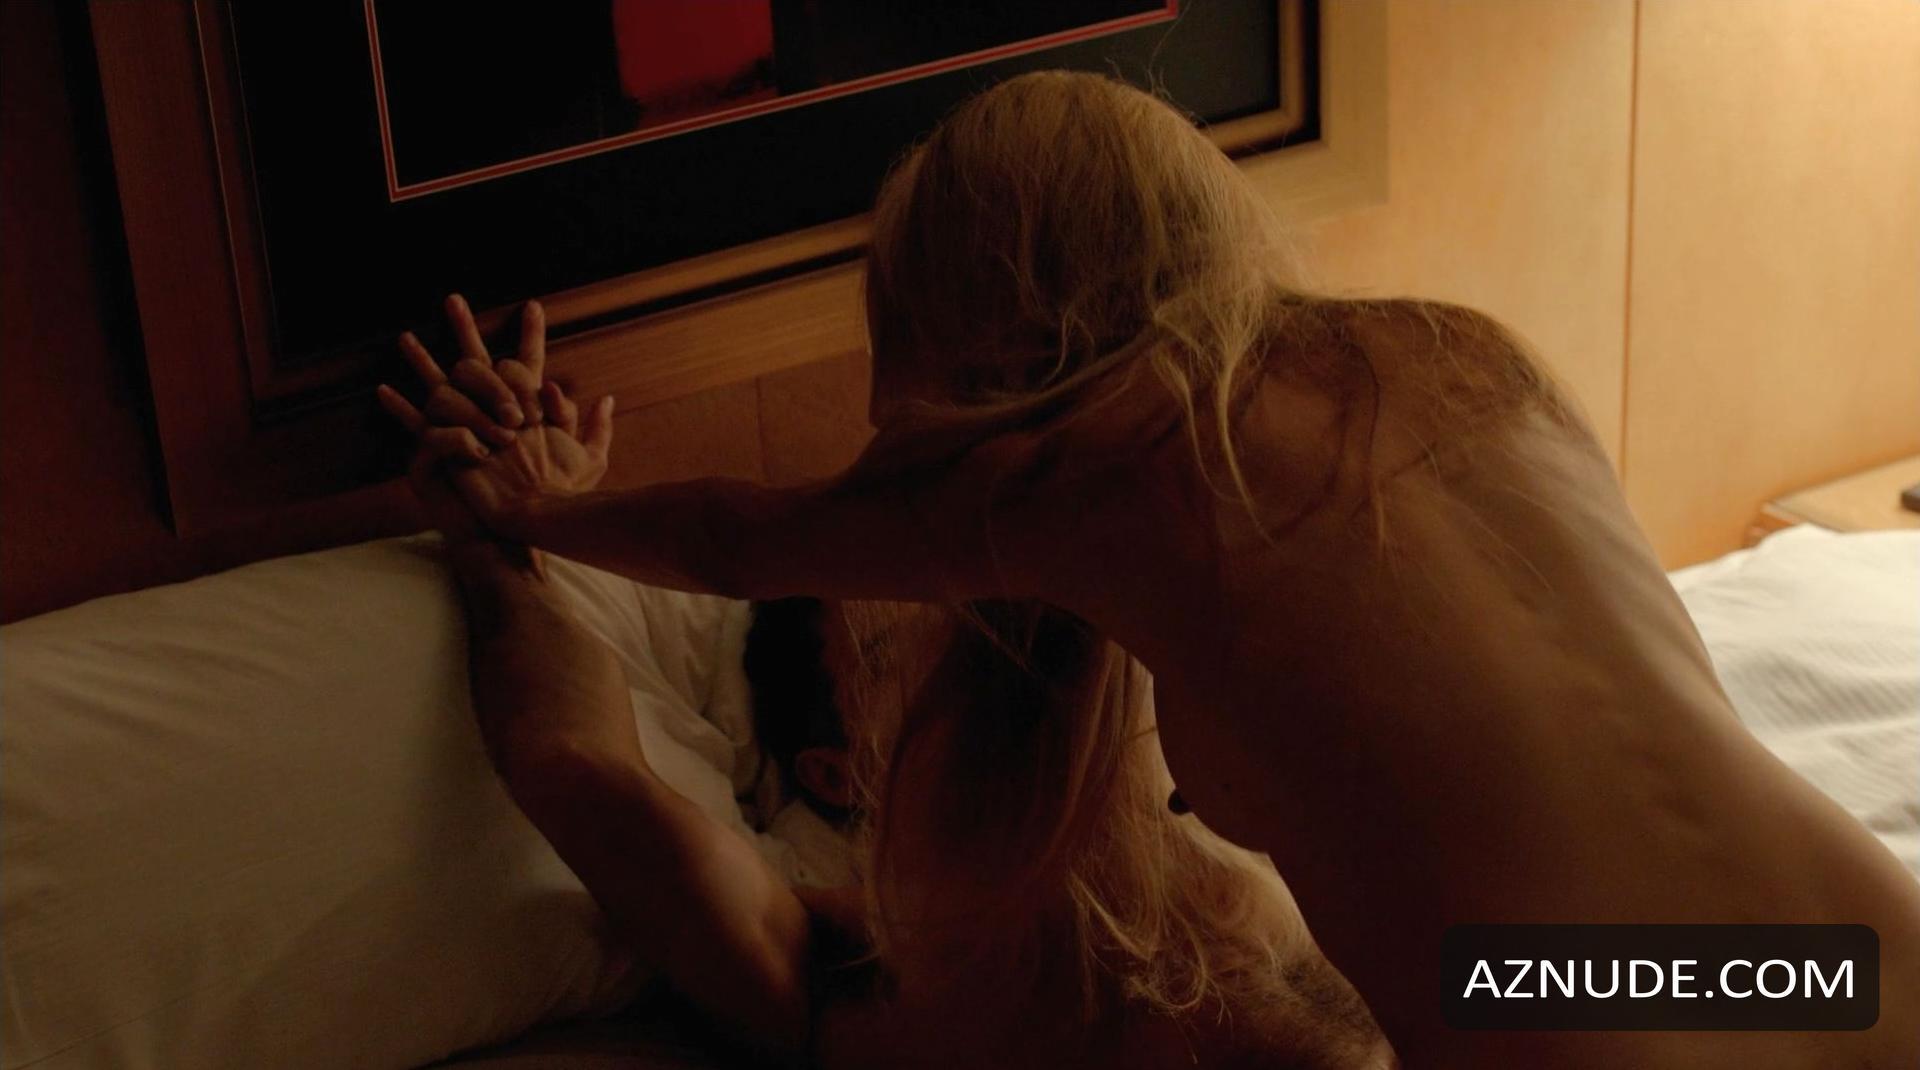 Gwyneth paltrow nude movies-4680